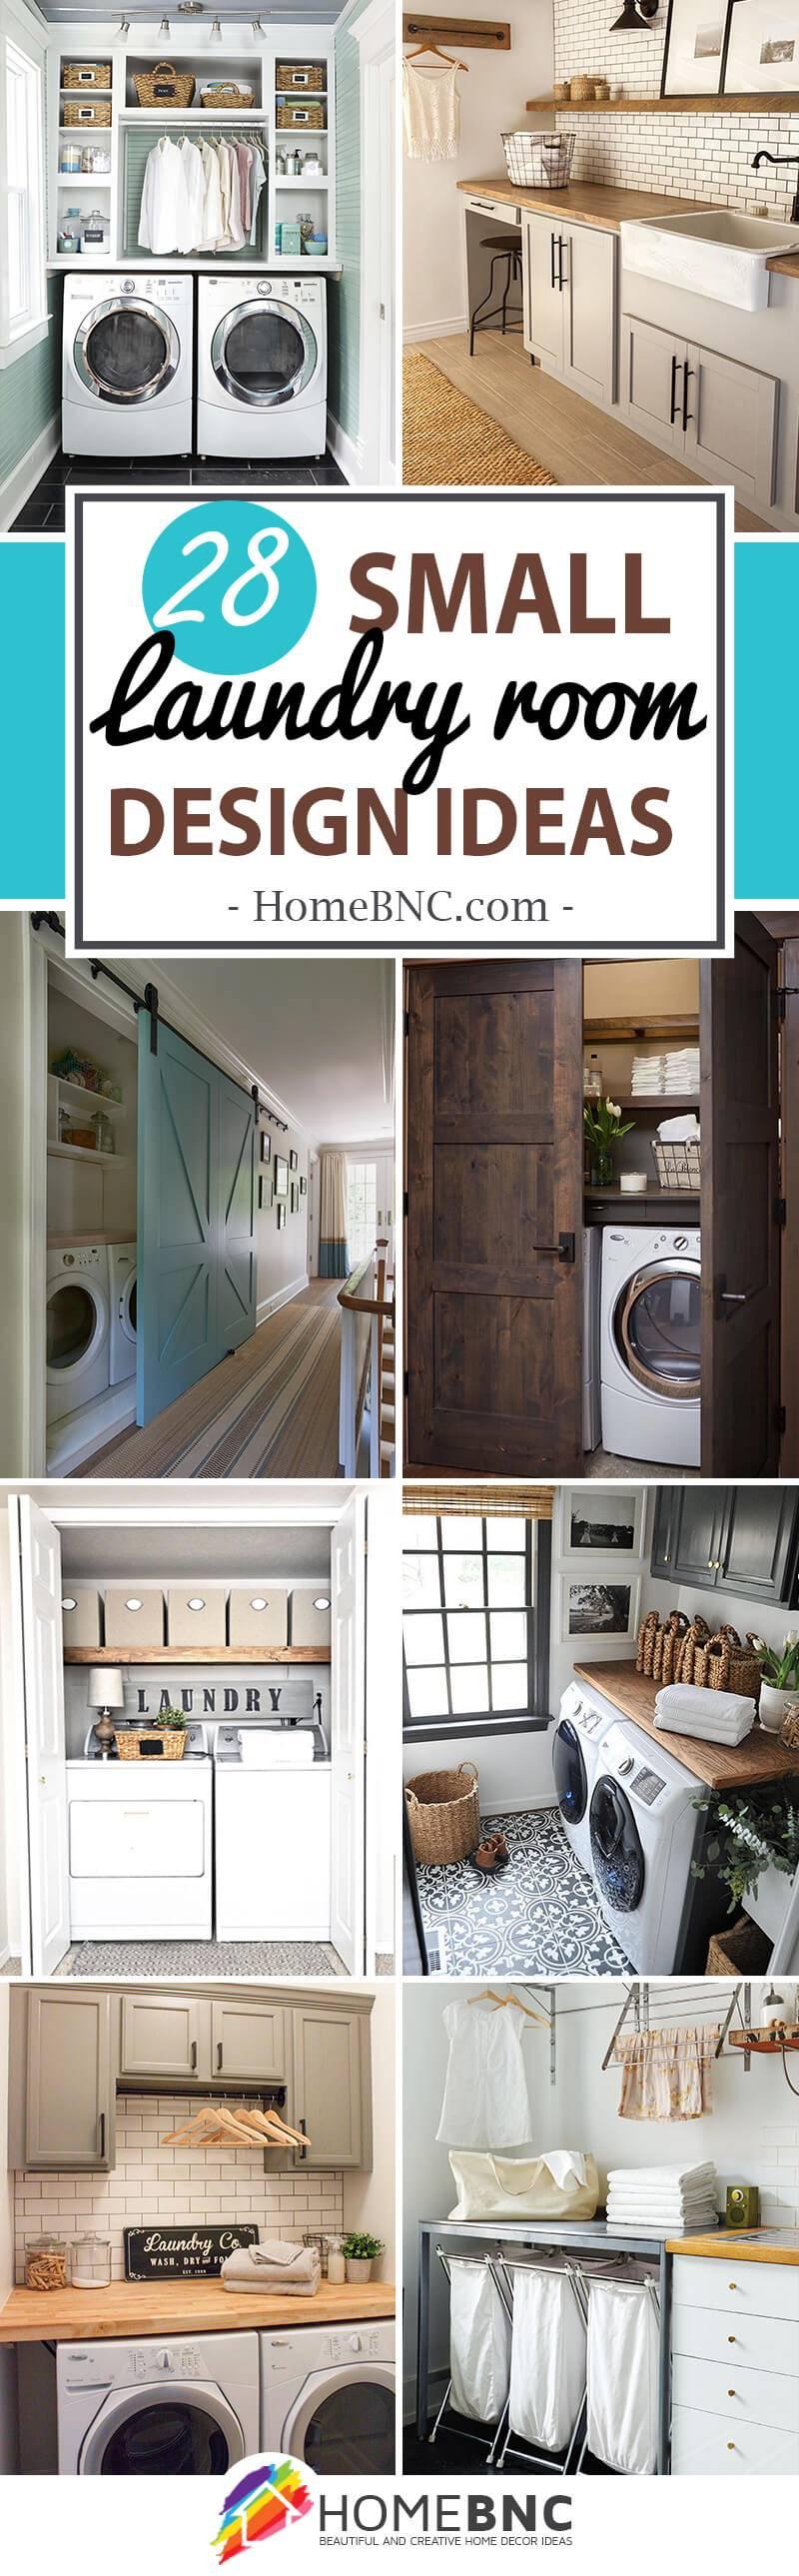 small laundry room design ideas pinterest share homebnc